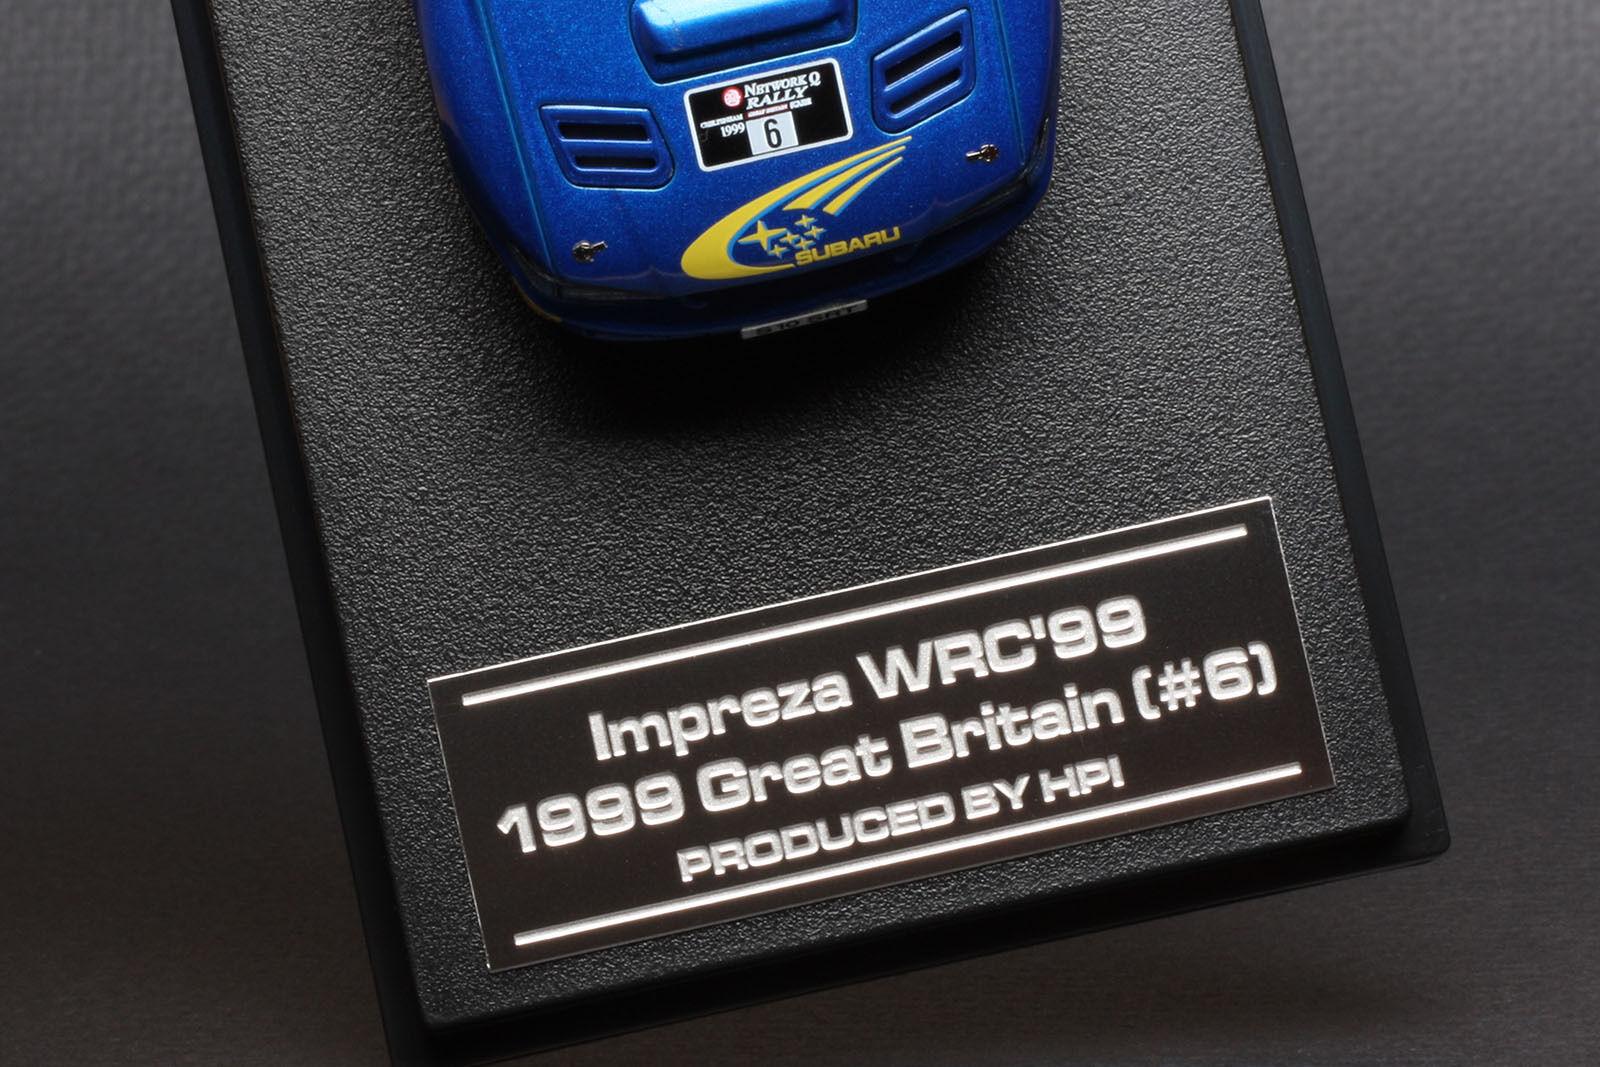 Subaru Impreza Impreza Impreza Great Britain Rally Juha Kankkunen -- HPI  43 d09c82